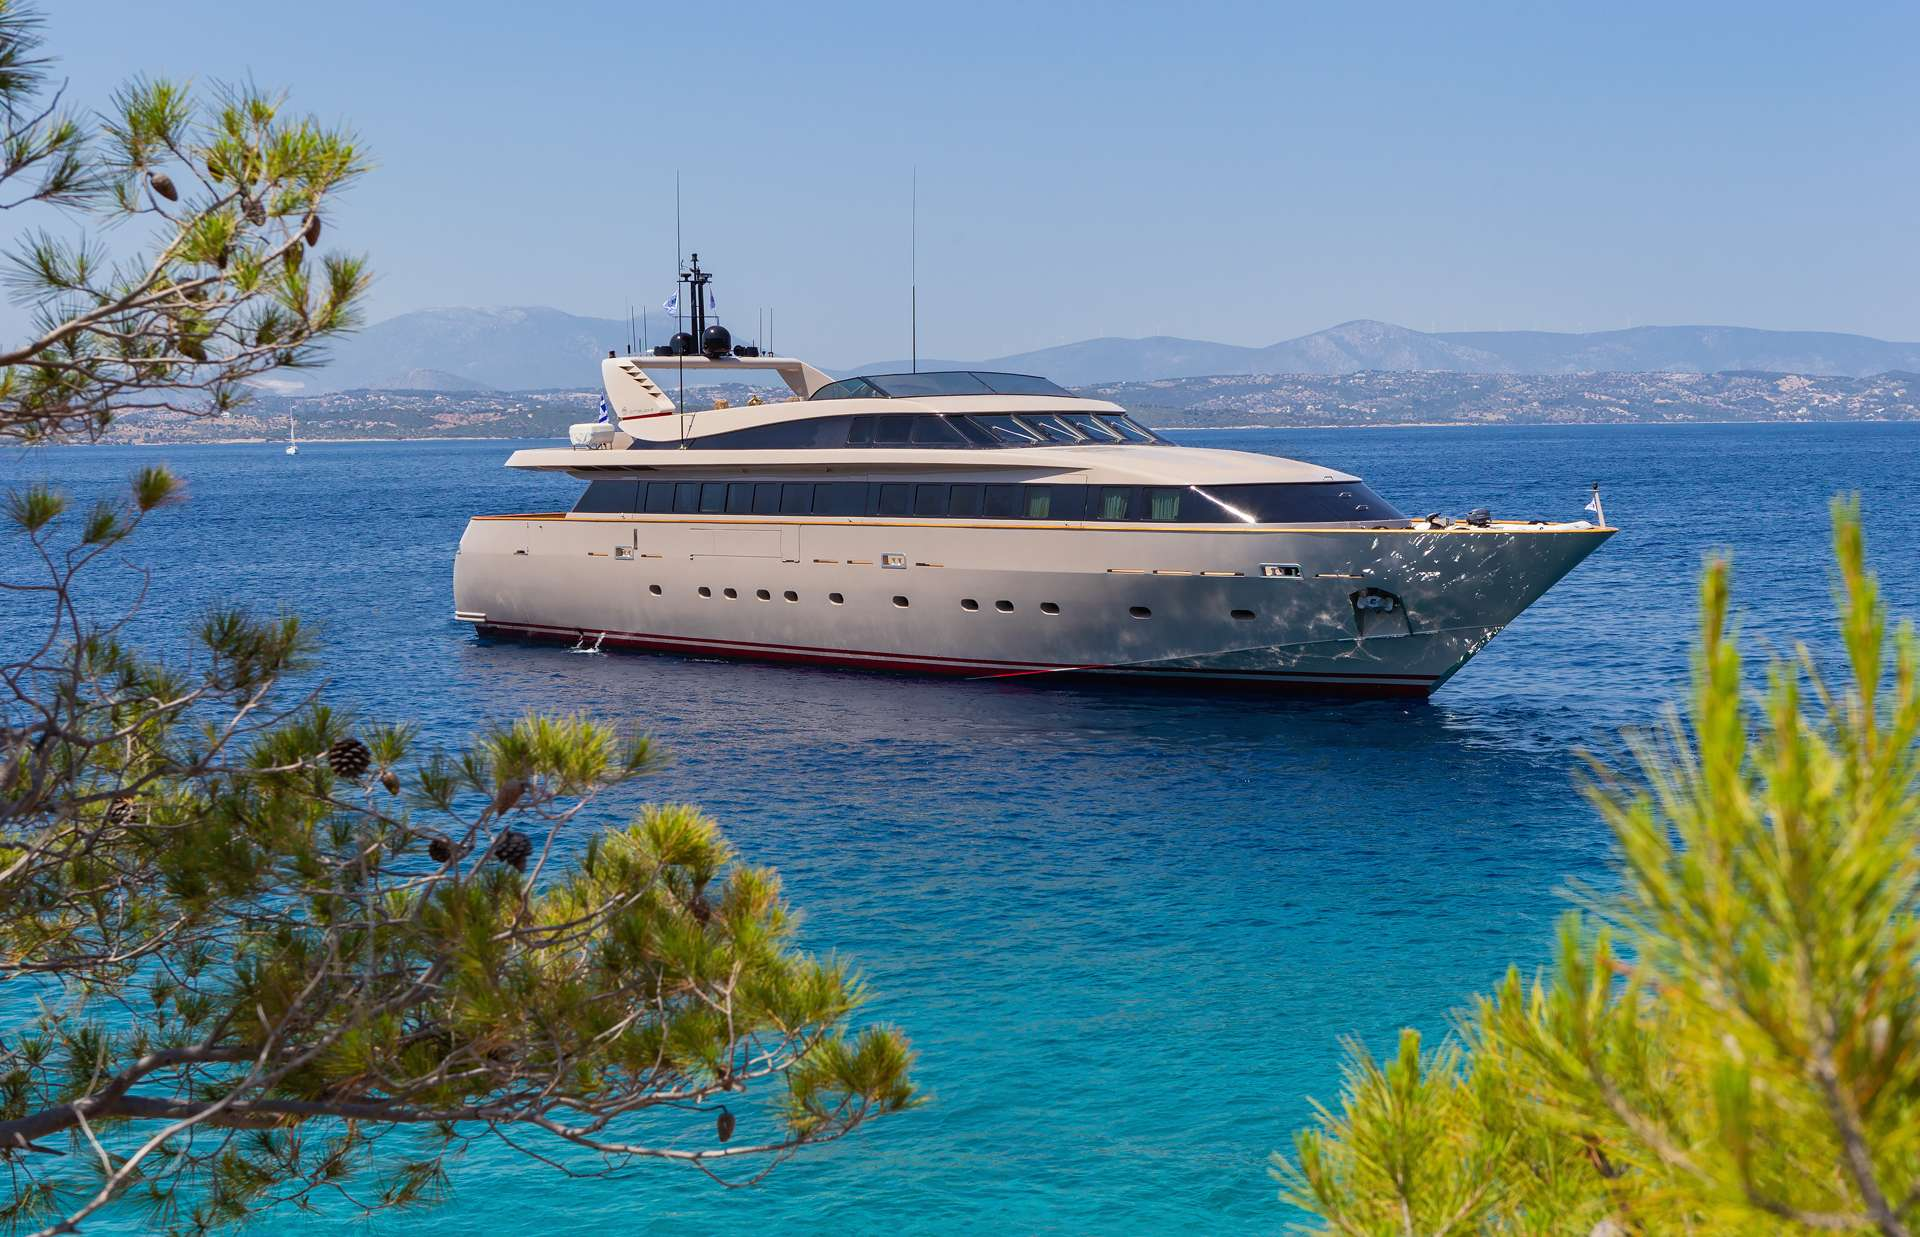 Main image of CHRISTINA V yacht